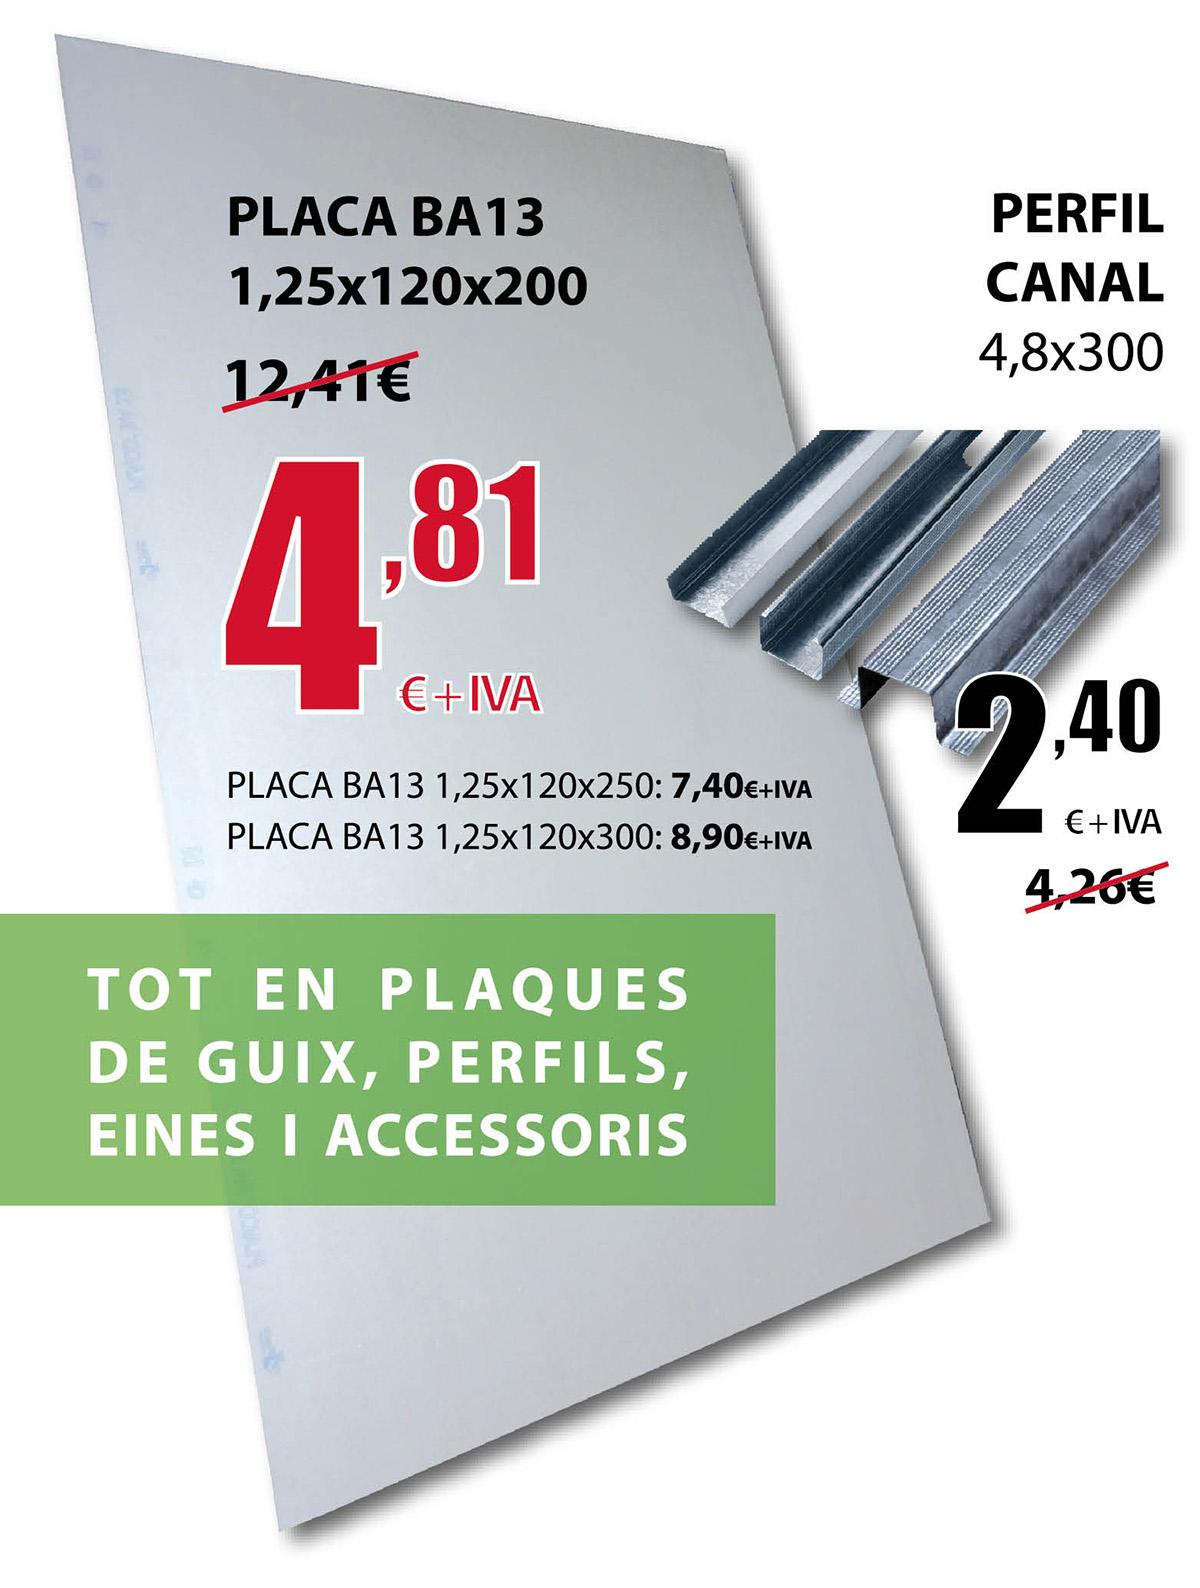 Oferta placa de yeso BA13 en Terrassa